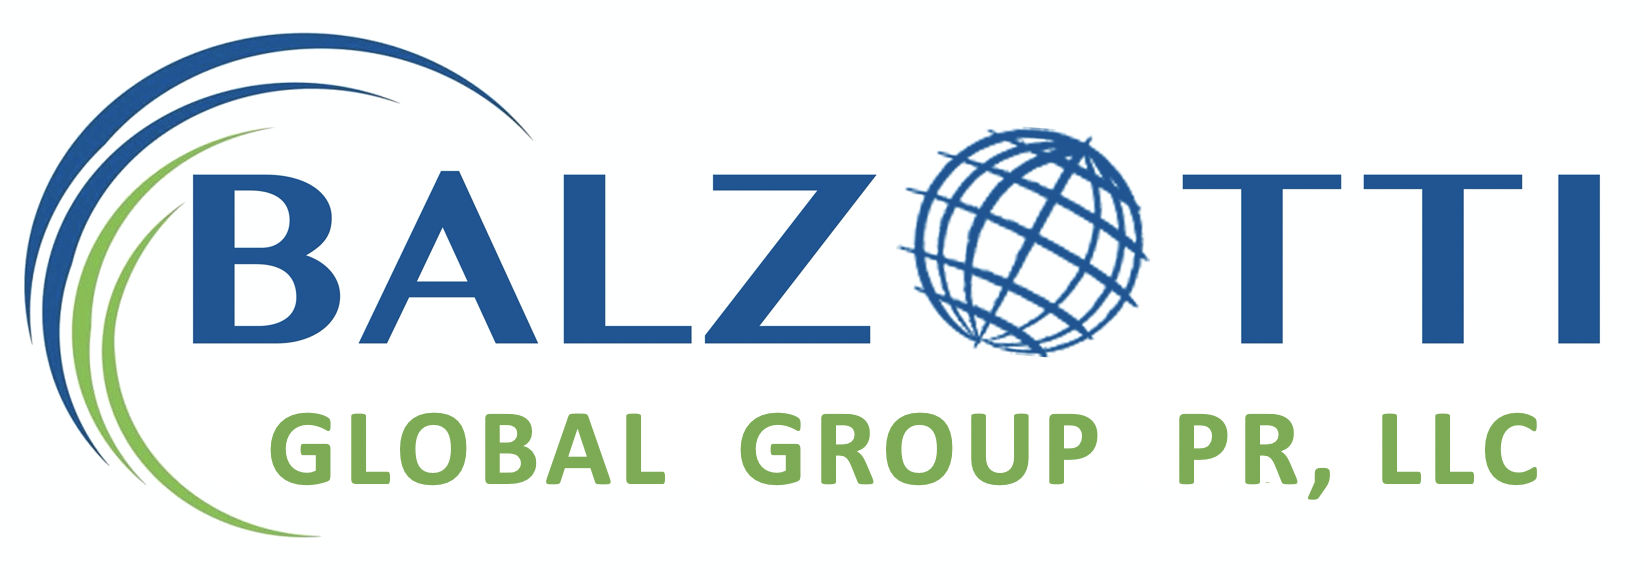 Balzotti Global Group PR